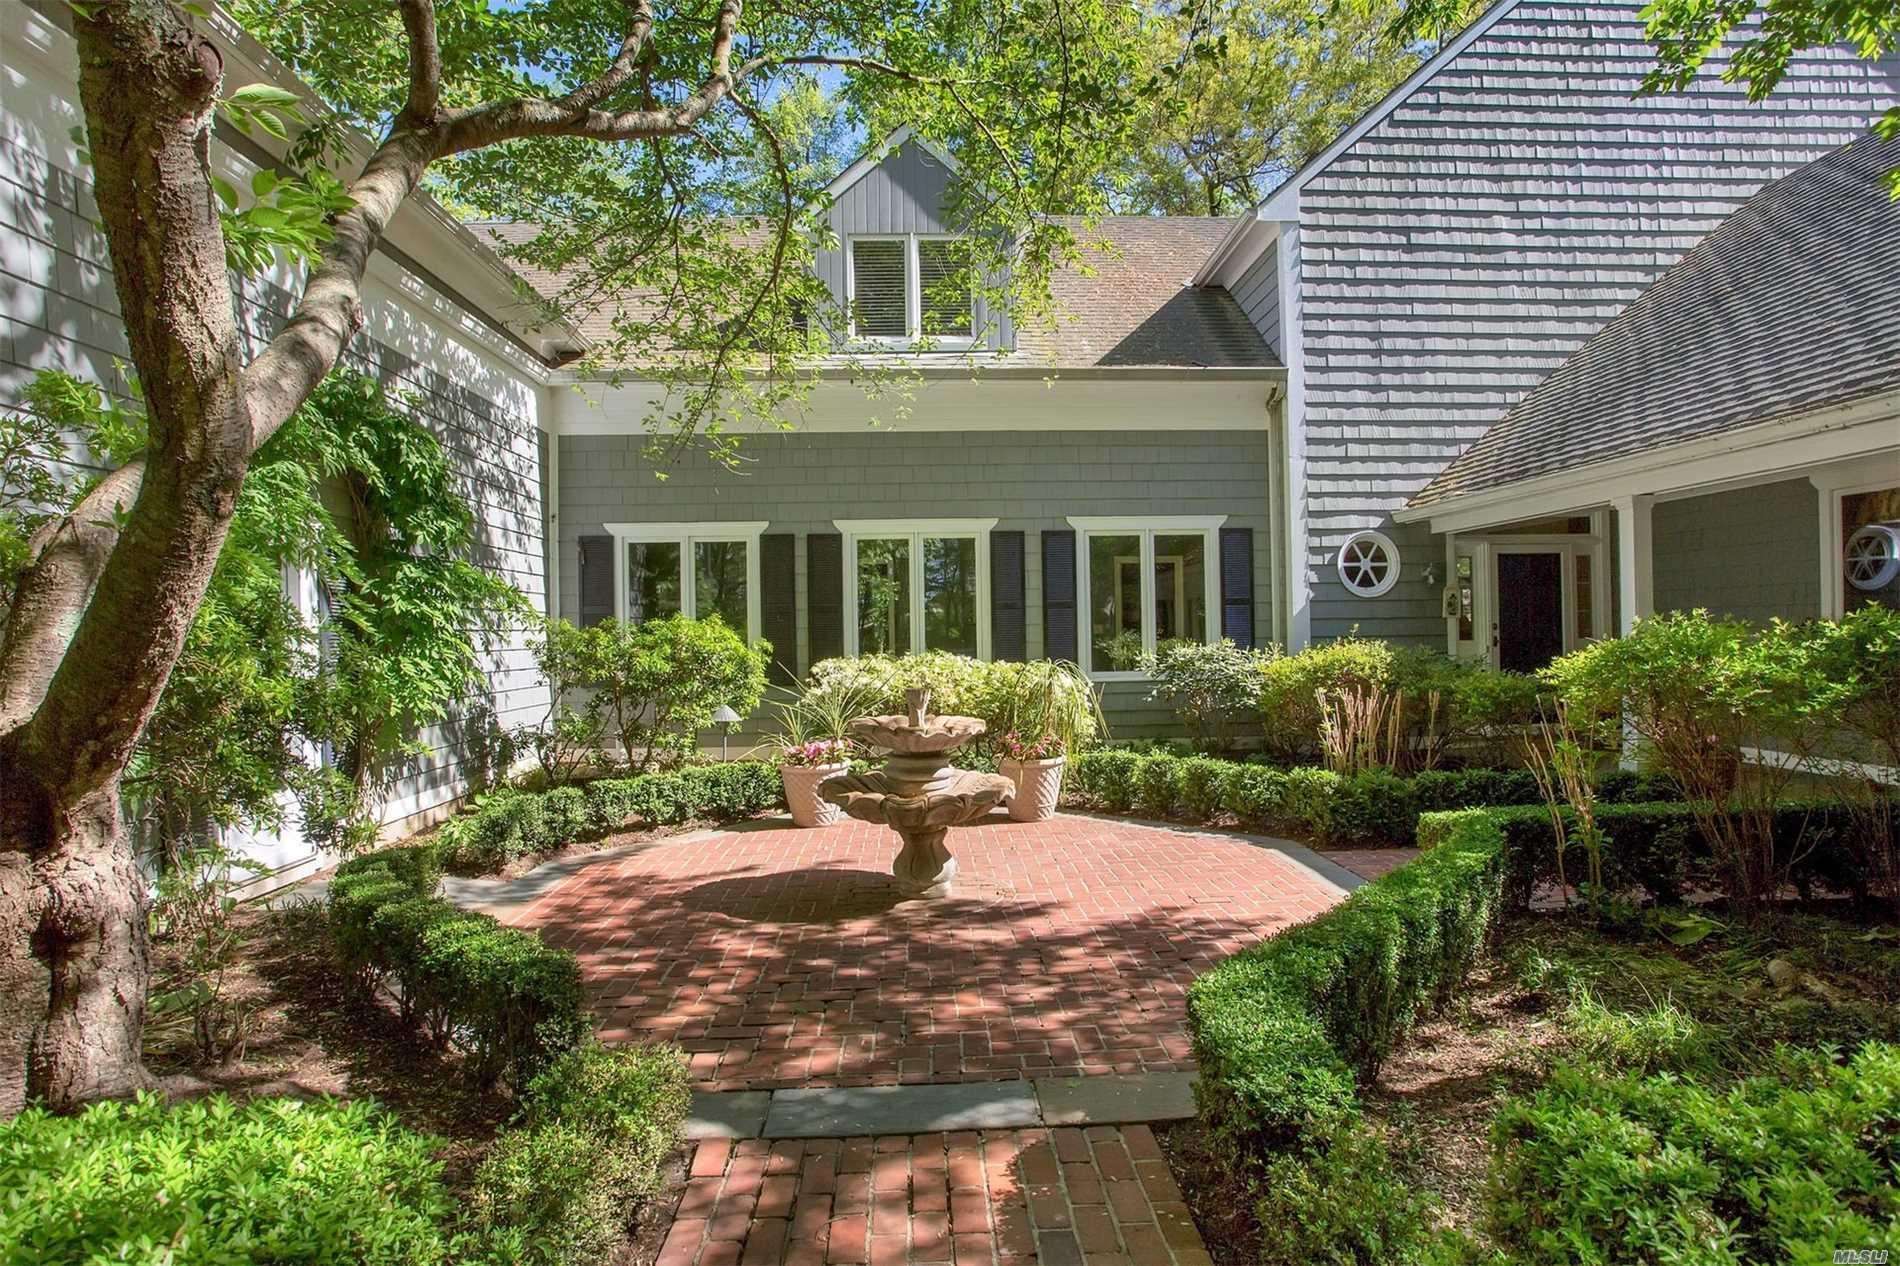 Property for sale at 33 Quail Ridge Road, Glen Cove NY 11542, Glen Cove,  New York 11542